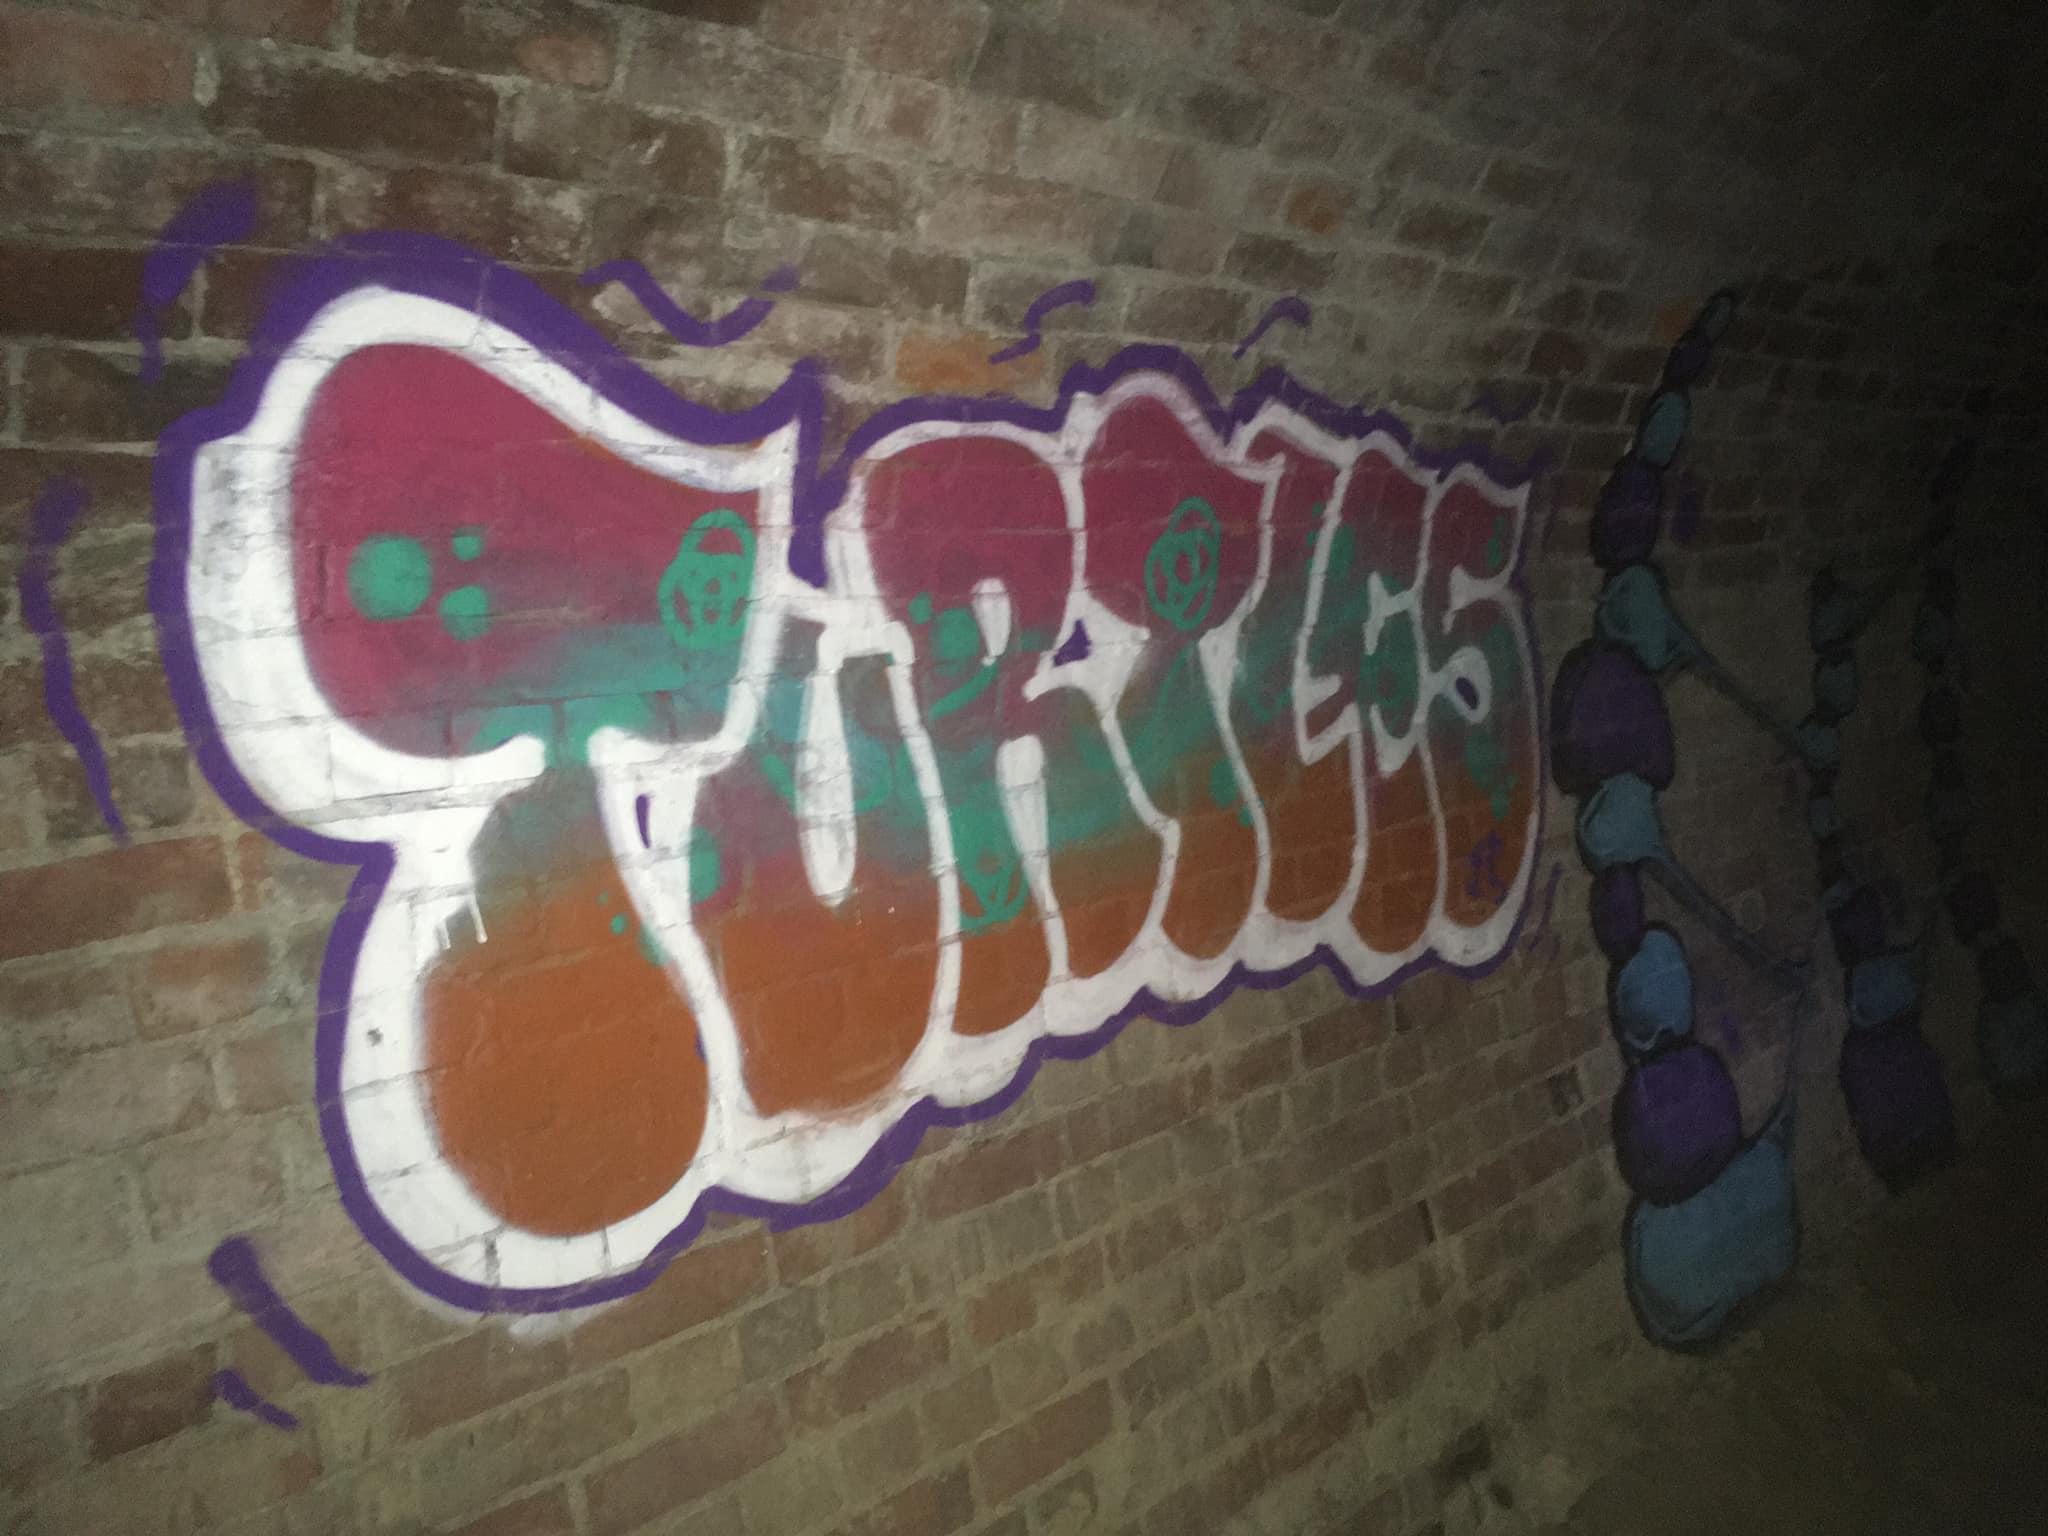 turtles graffiti art drain